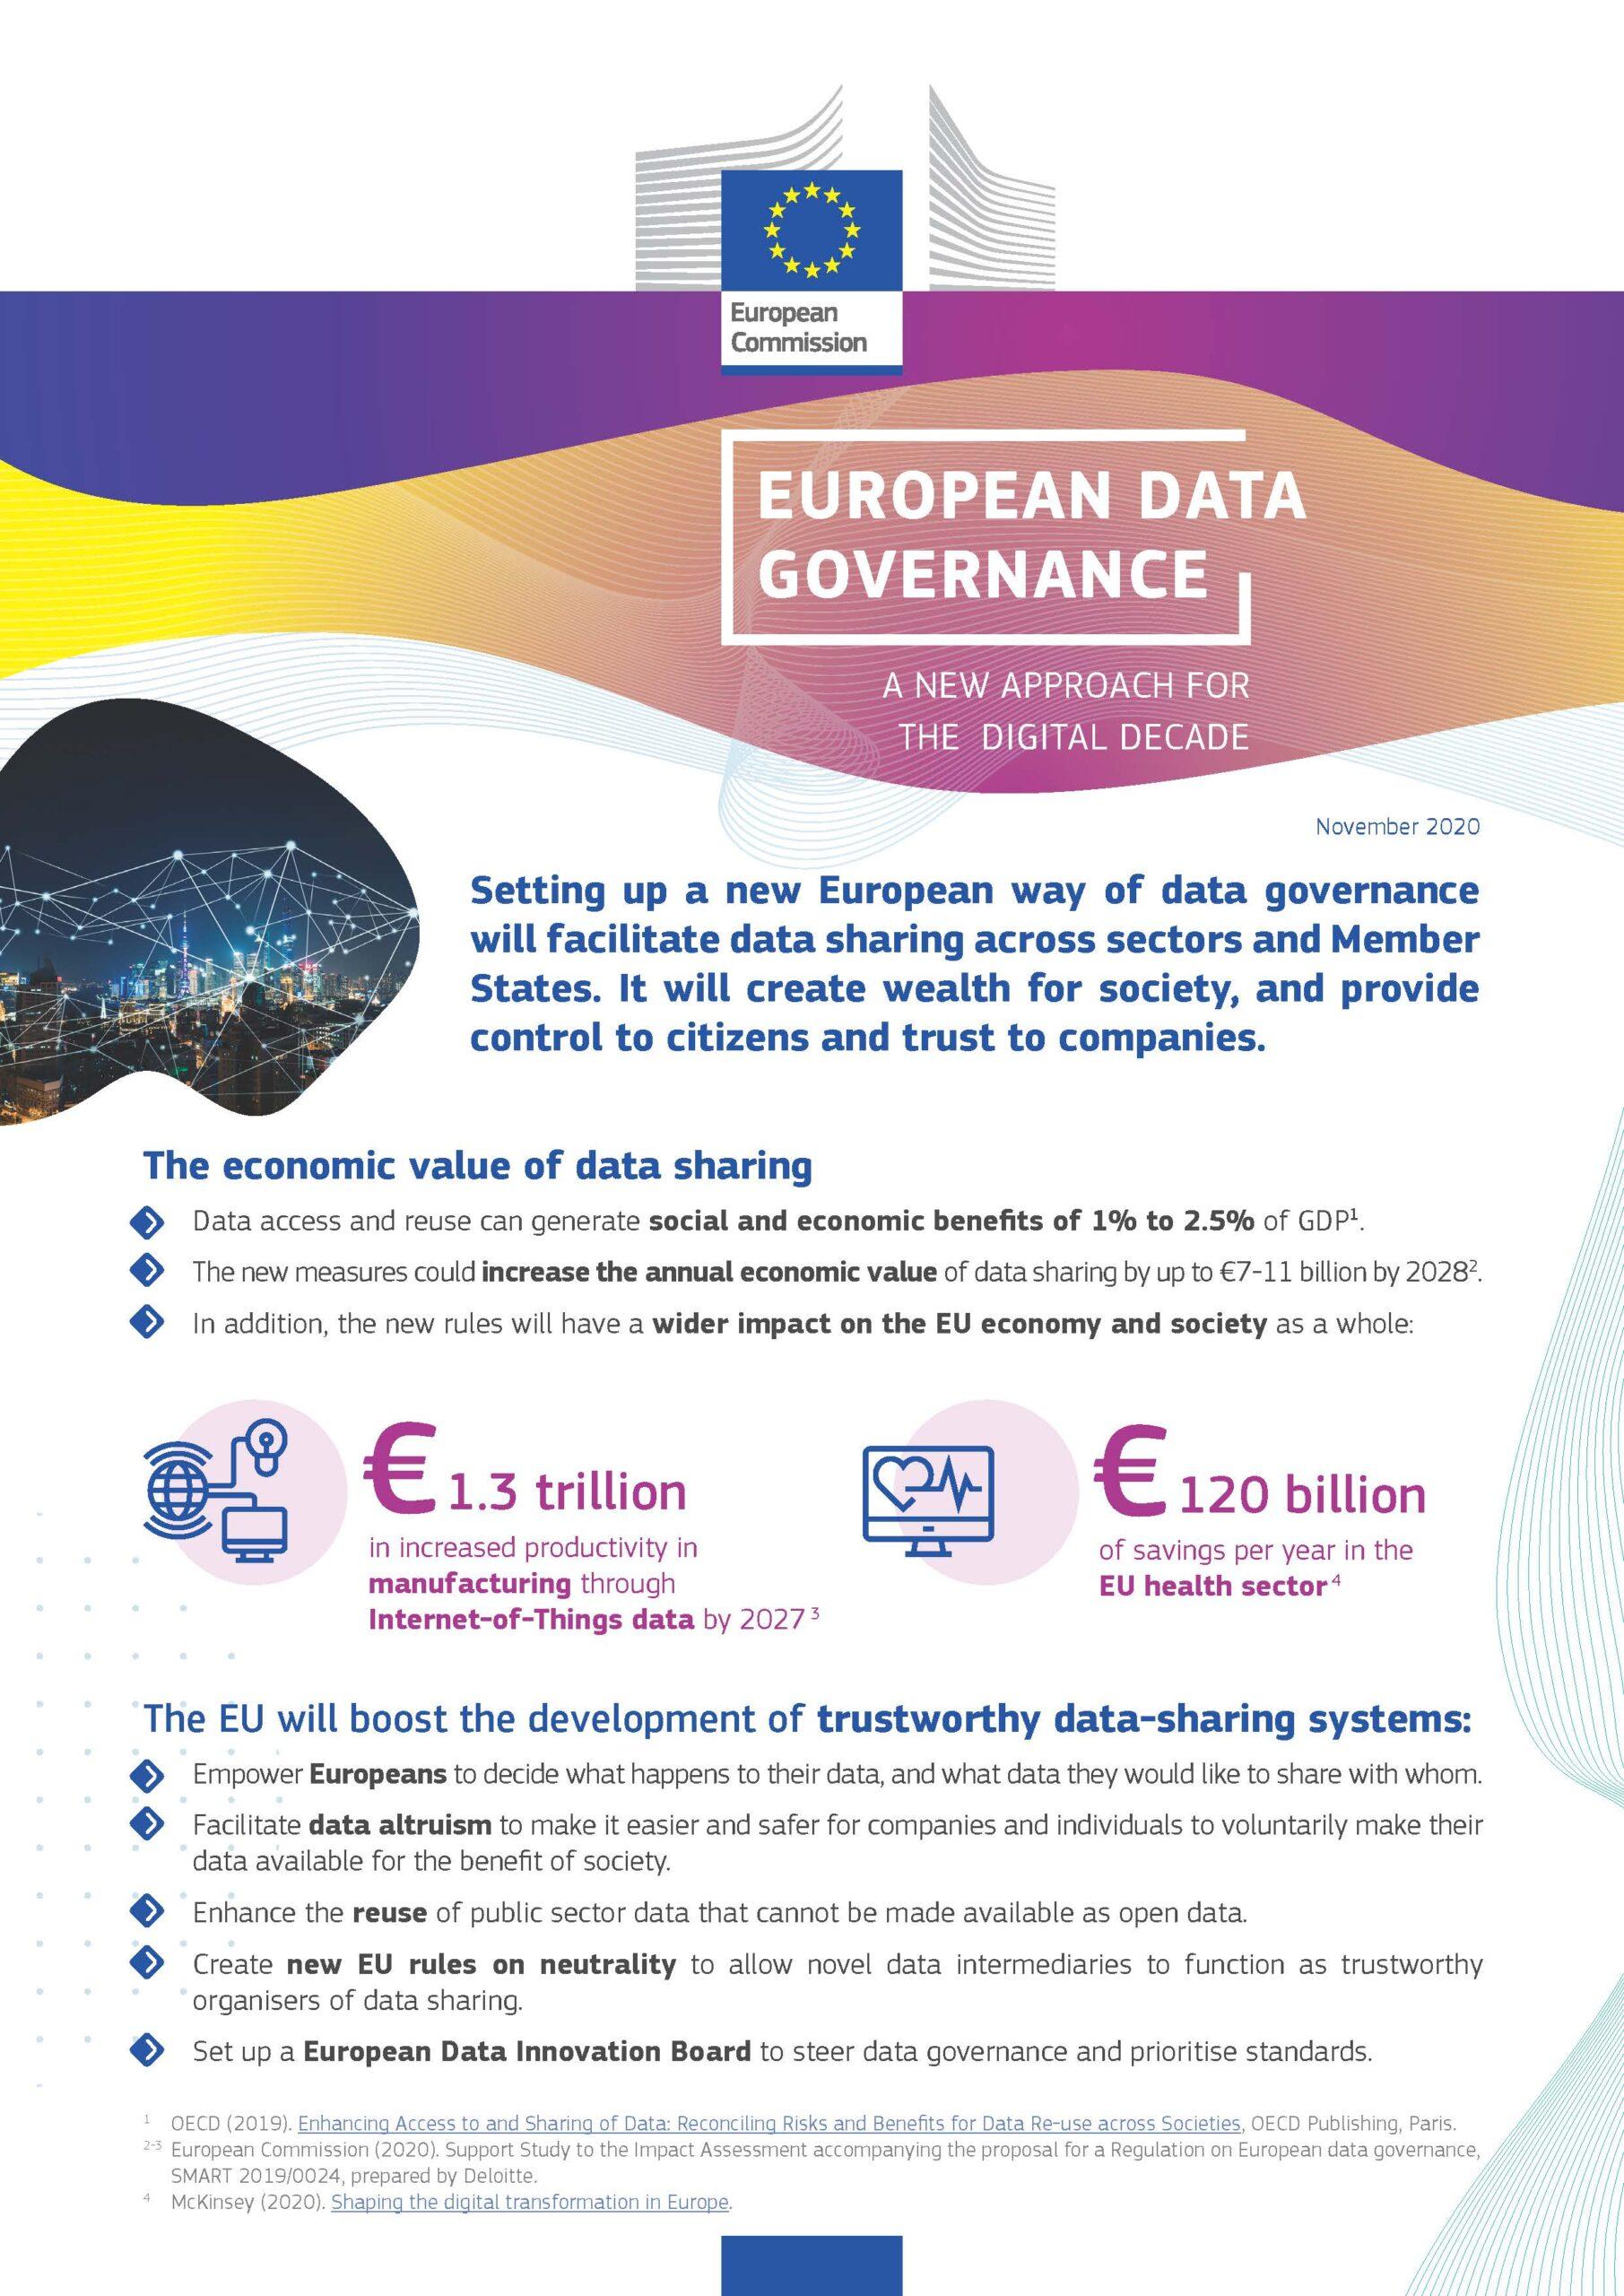 Data Governance Act, Source: European Commission, Nov 2020